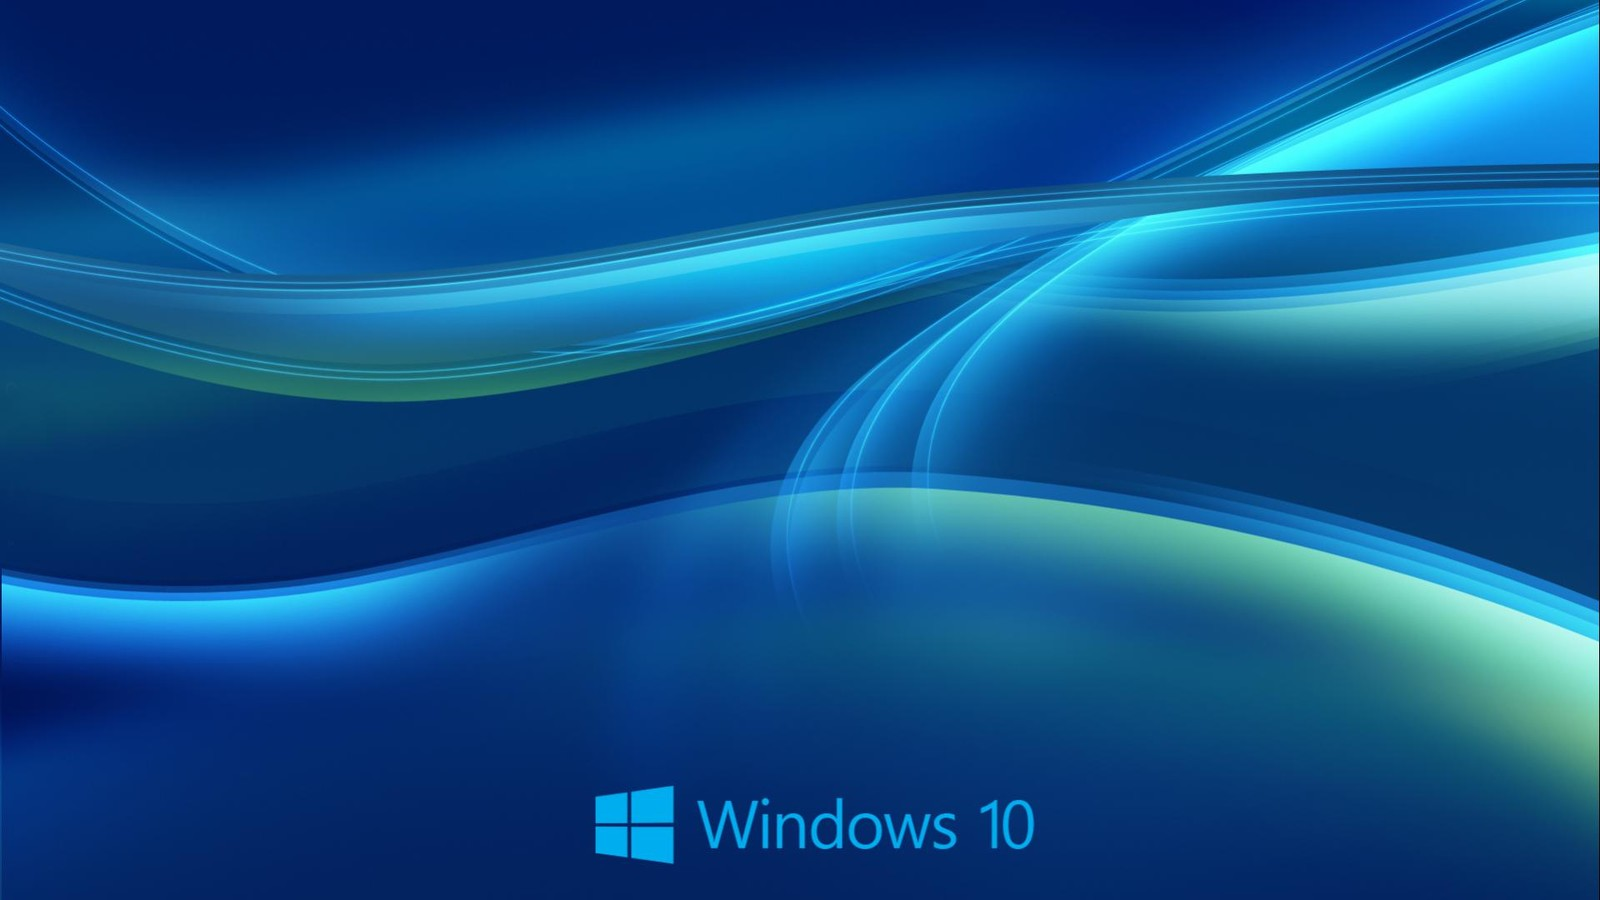 47+] Windows 10 Wallpaper 1600X900 on WallpaperSafari